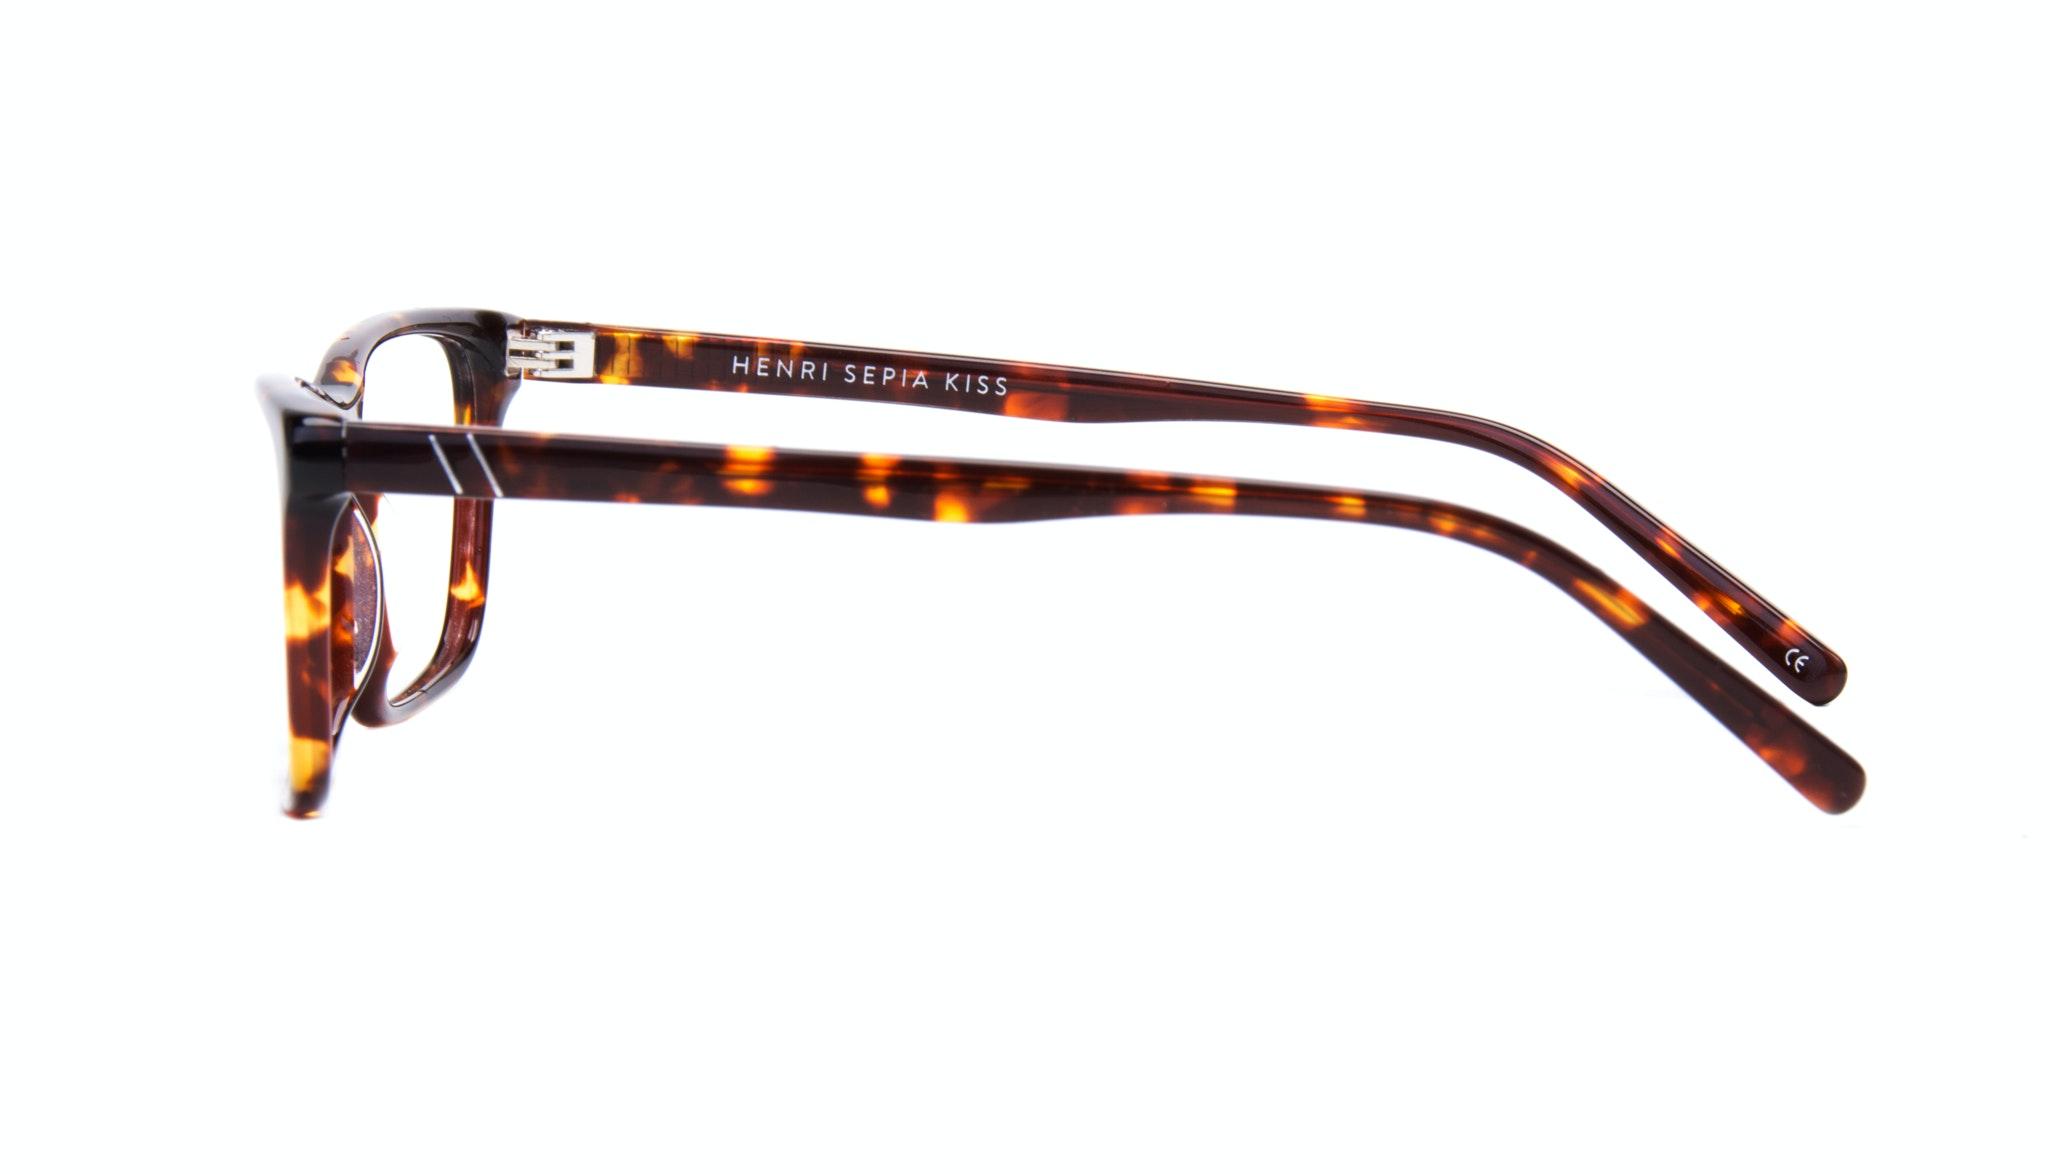 Affordable Fashion Glasses Rectangle Eyeglasses Men Henri Sepia Kiss Side